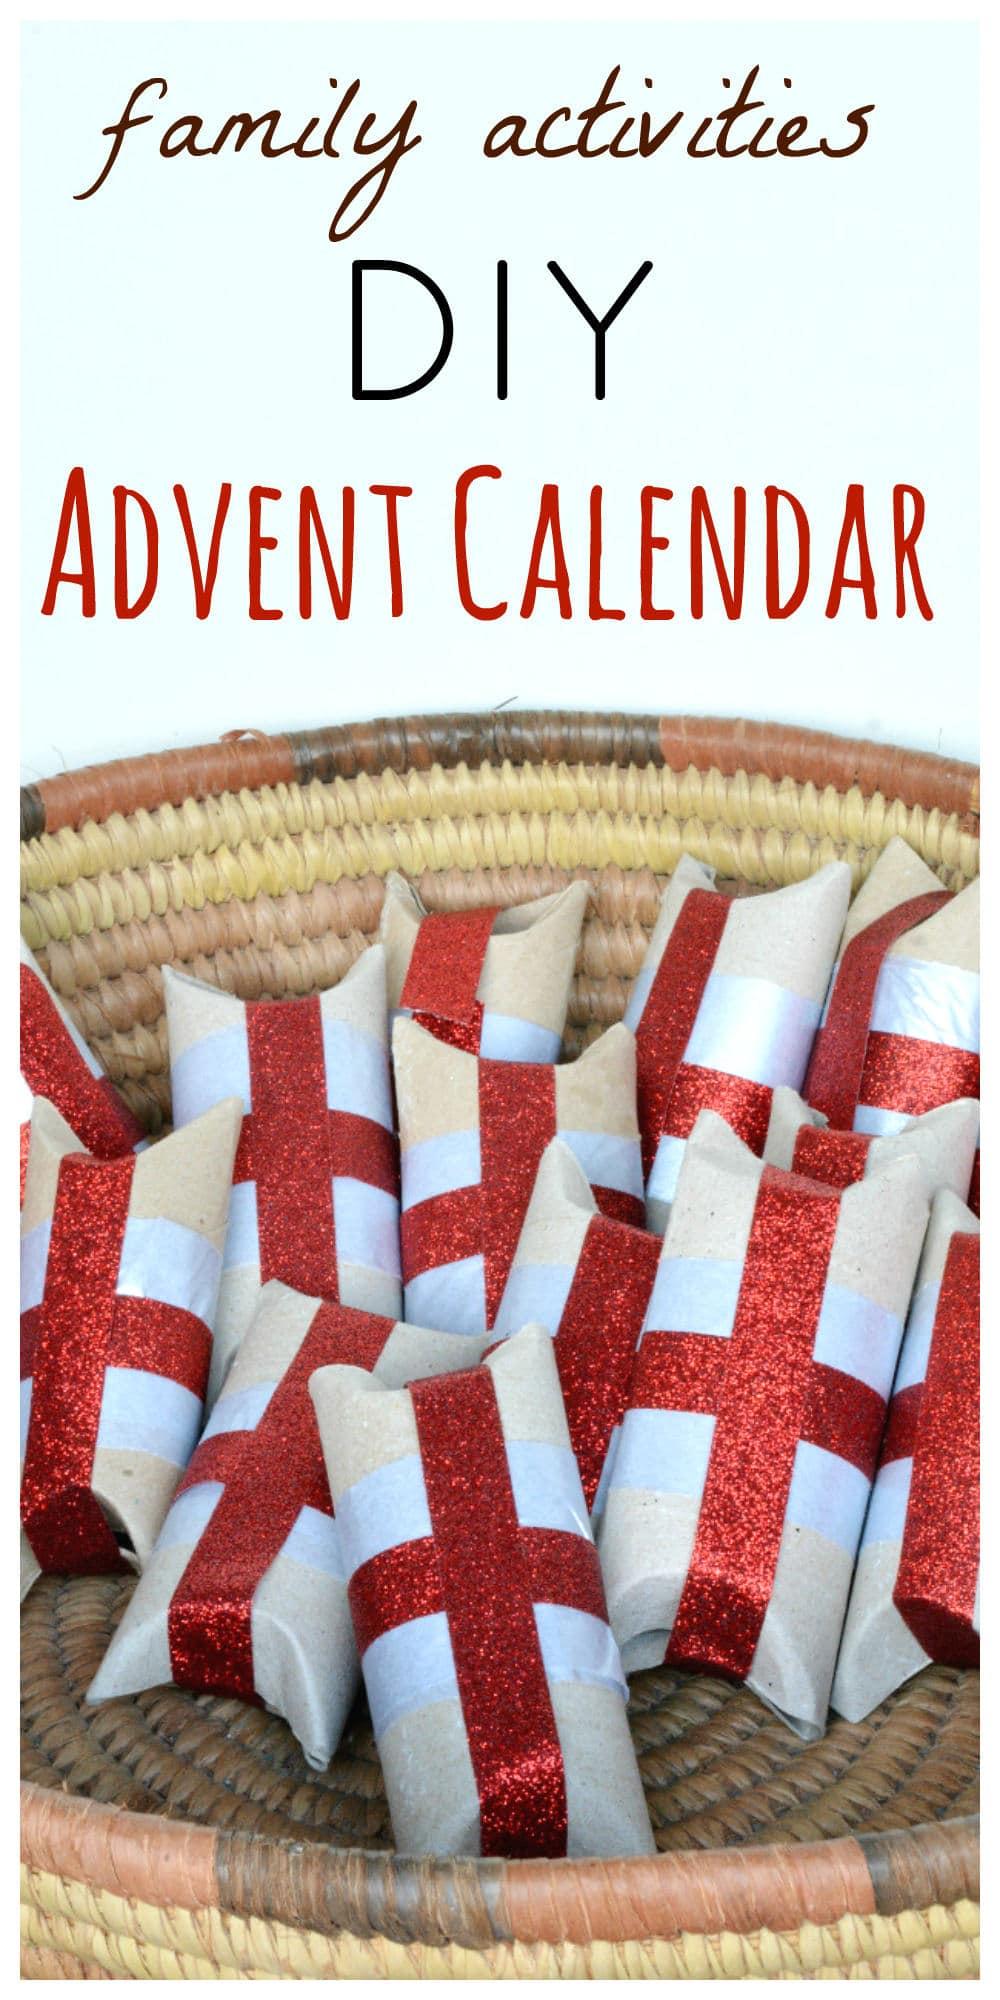 Diy Calendar Uk : Diy advent calendar from toilet rolls vicky myers creations